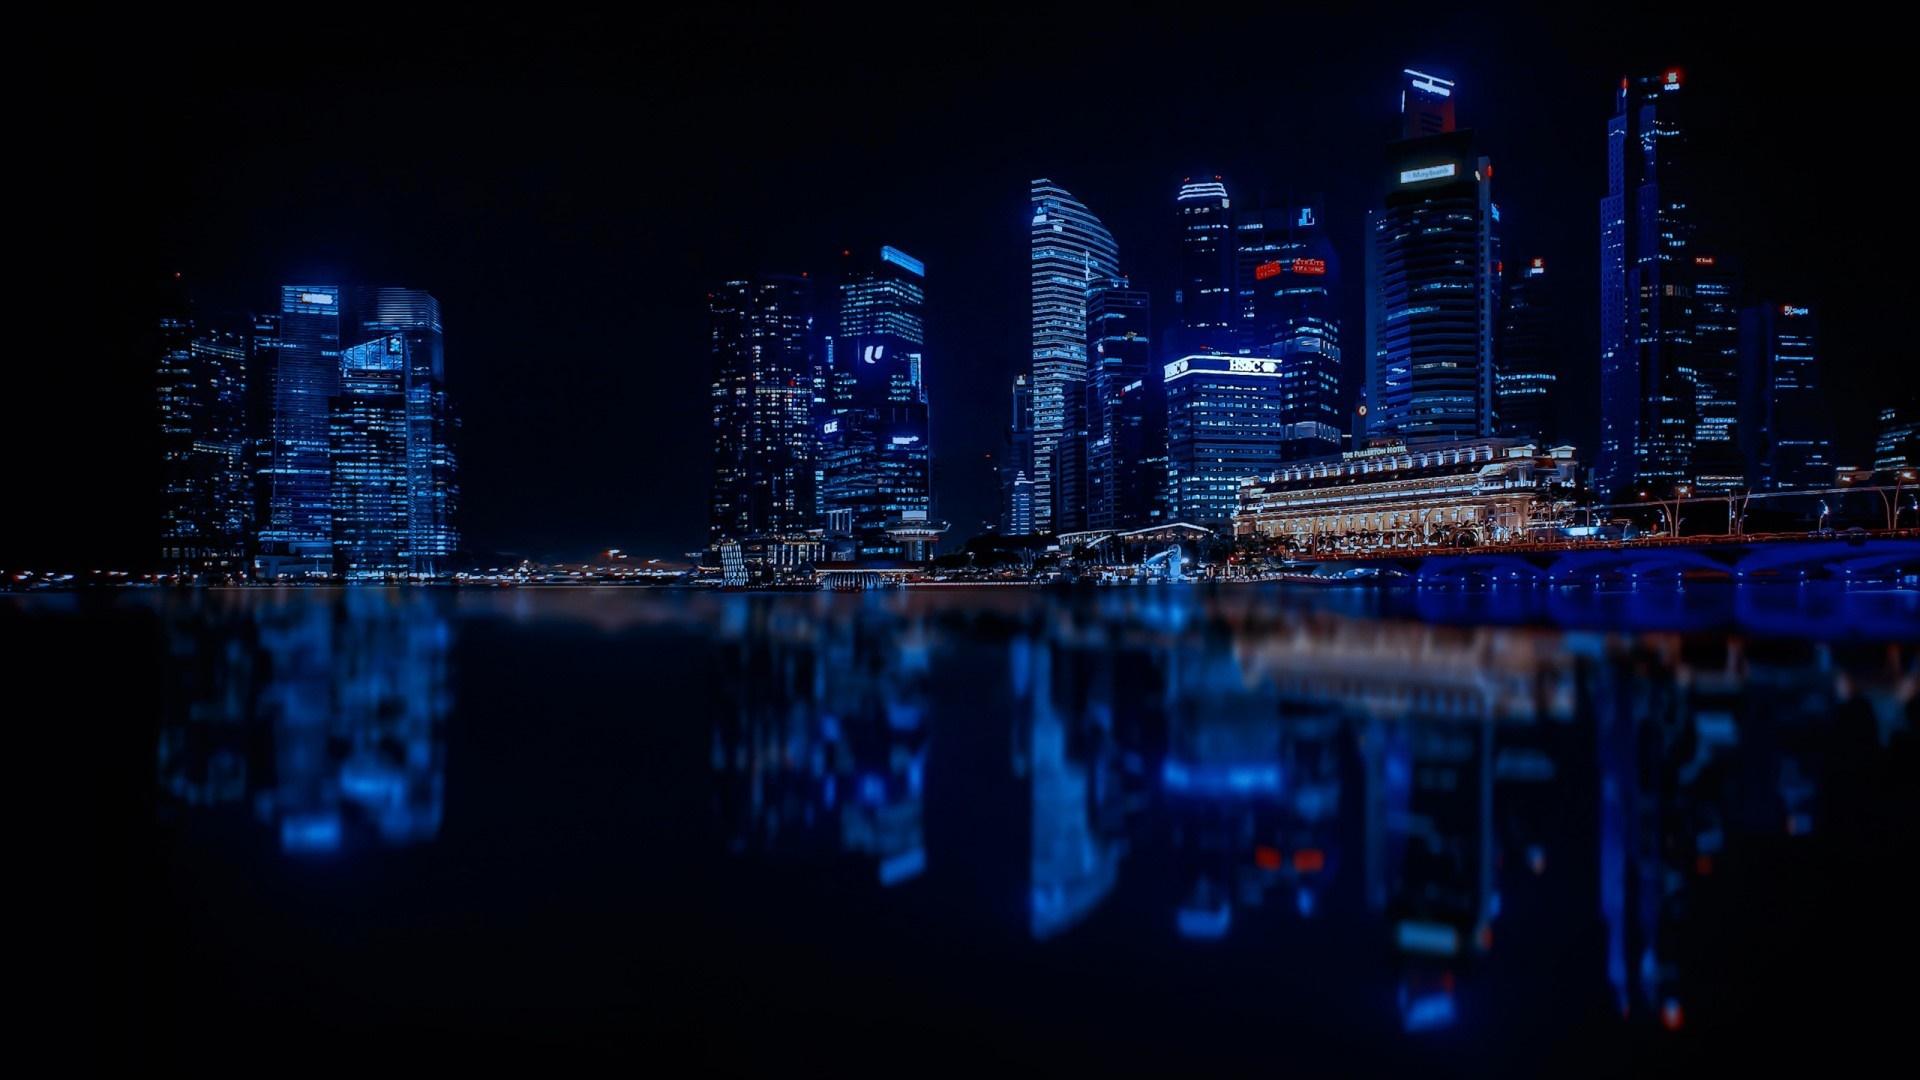 Illuminated Singapore reflection wallpaper